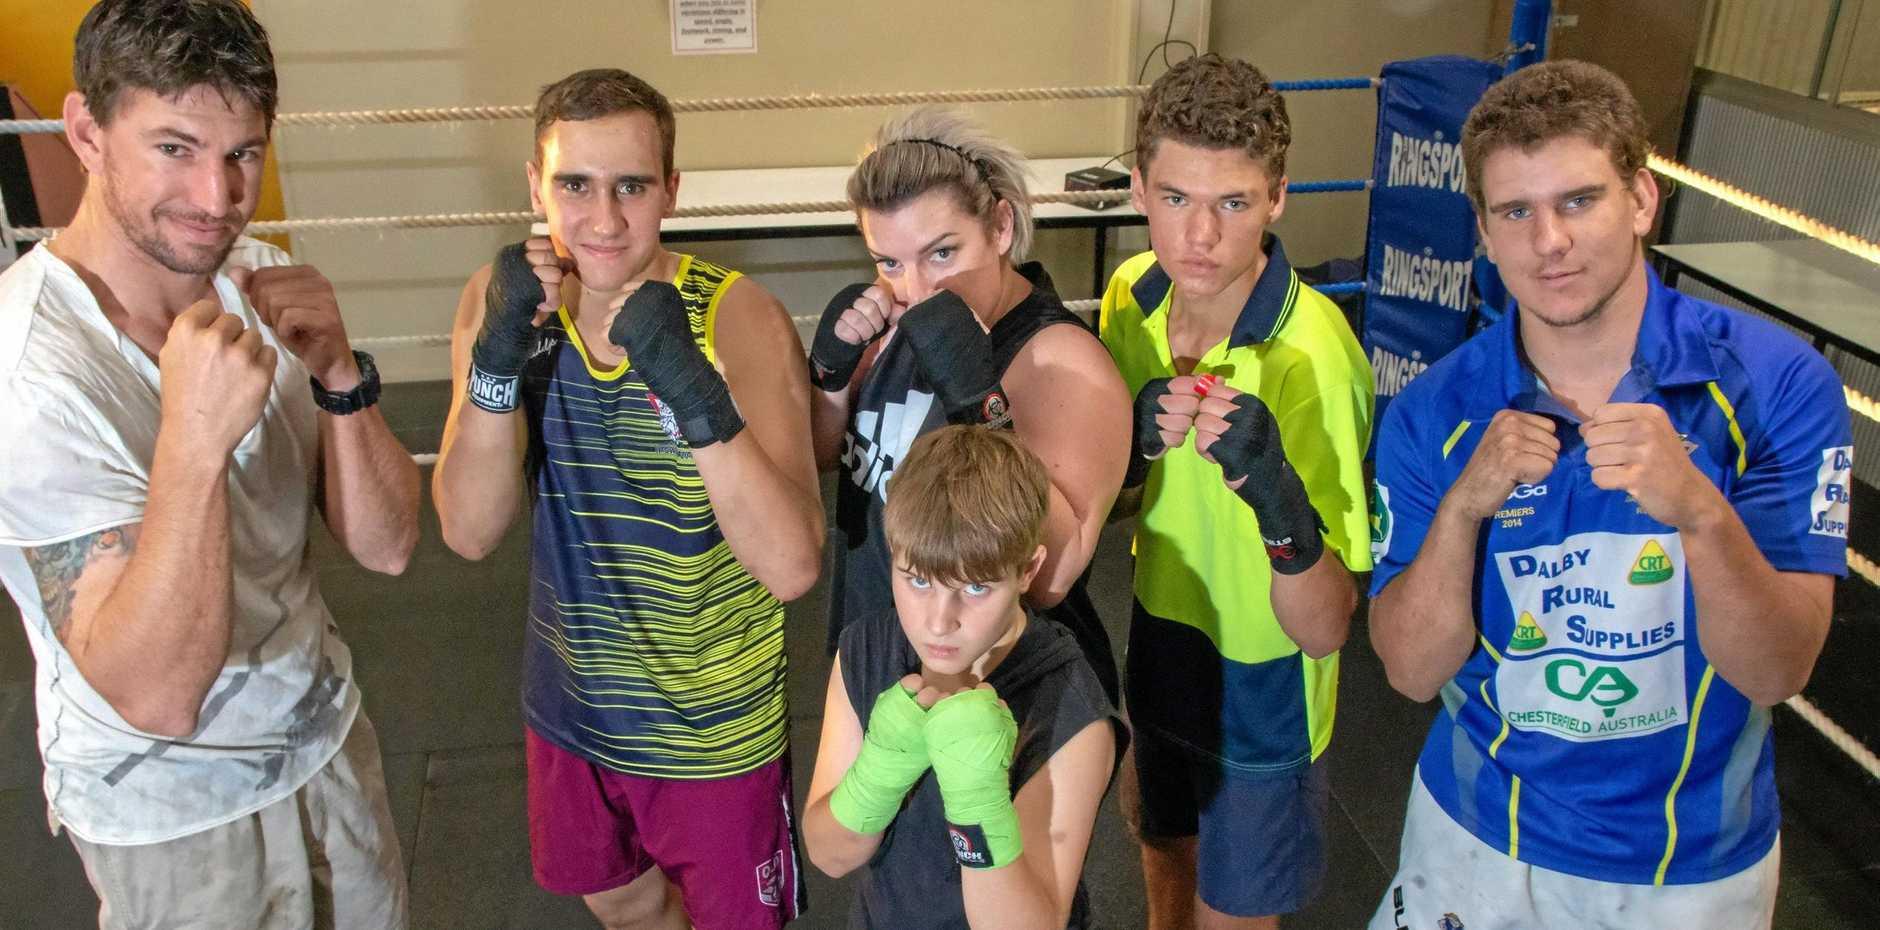 FOCUSED: Steven Tapp, Chase and Judd Alderton, Jayde Baldwin, Harry Jones and Harro Nolan are busy preparing for next week's fights.